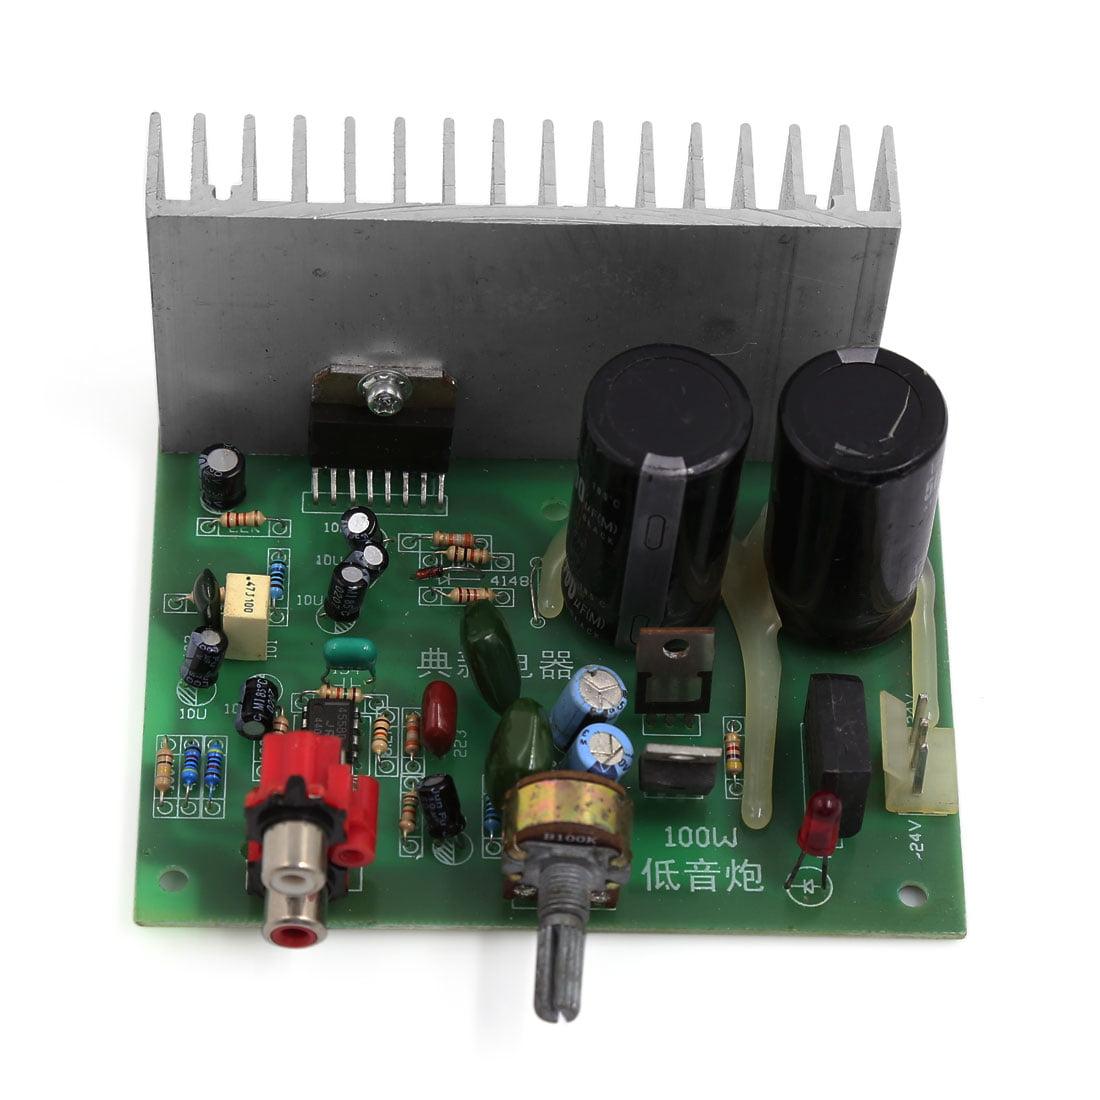 Unique Bargains 18V-26V 100W LFE Subwoofer Audio Stereo Power Amplifier Board for Motorcycle